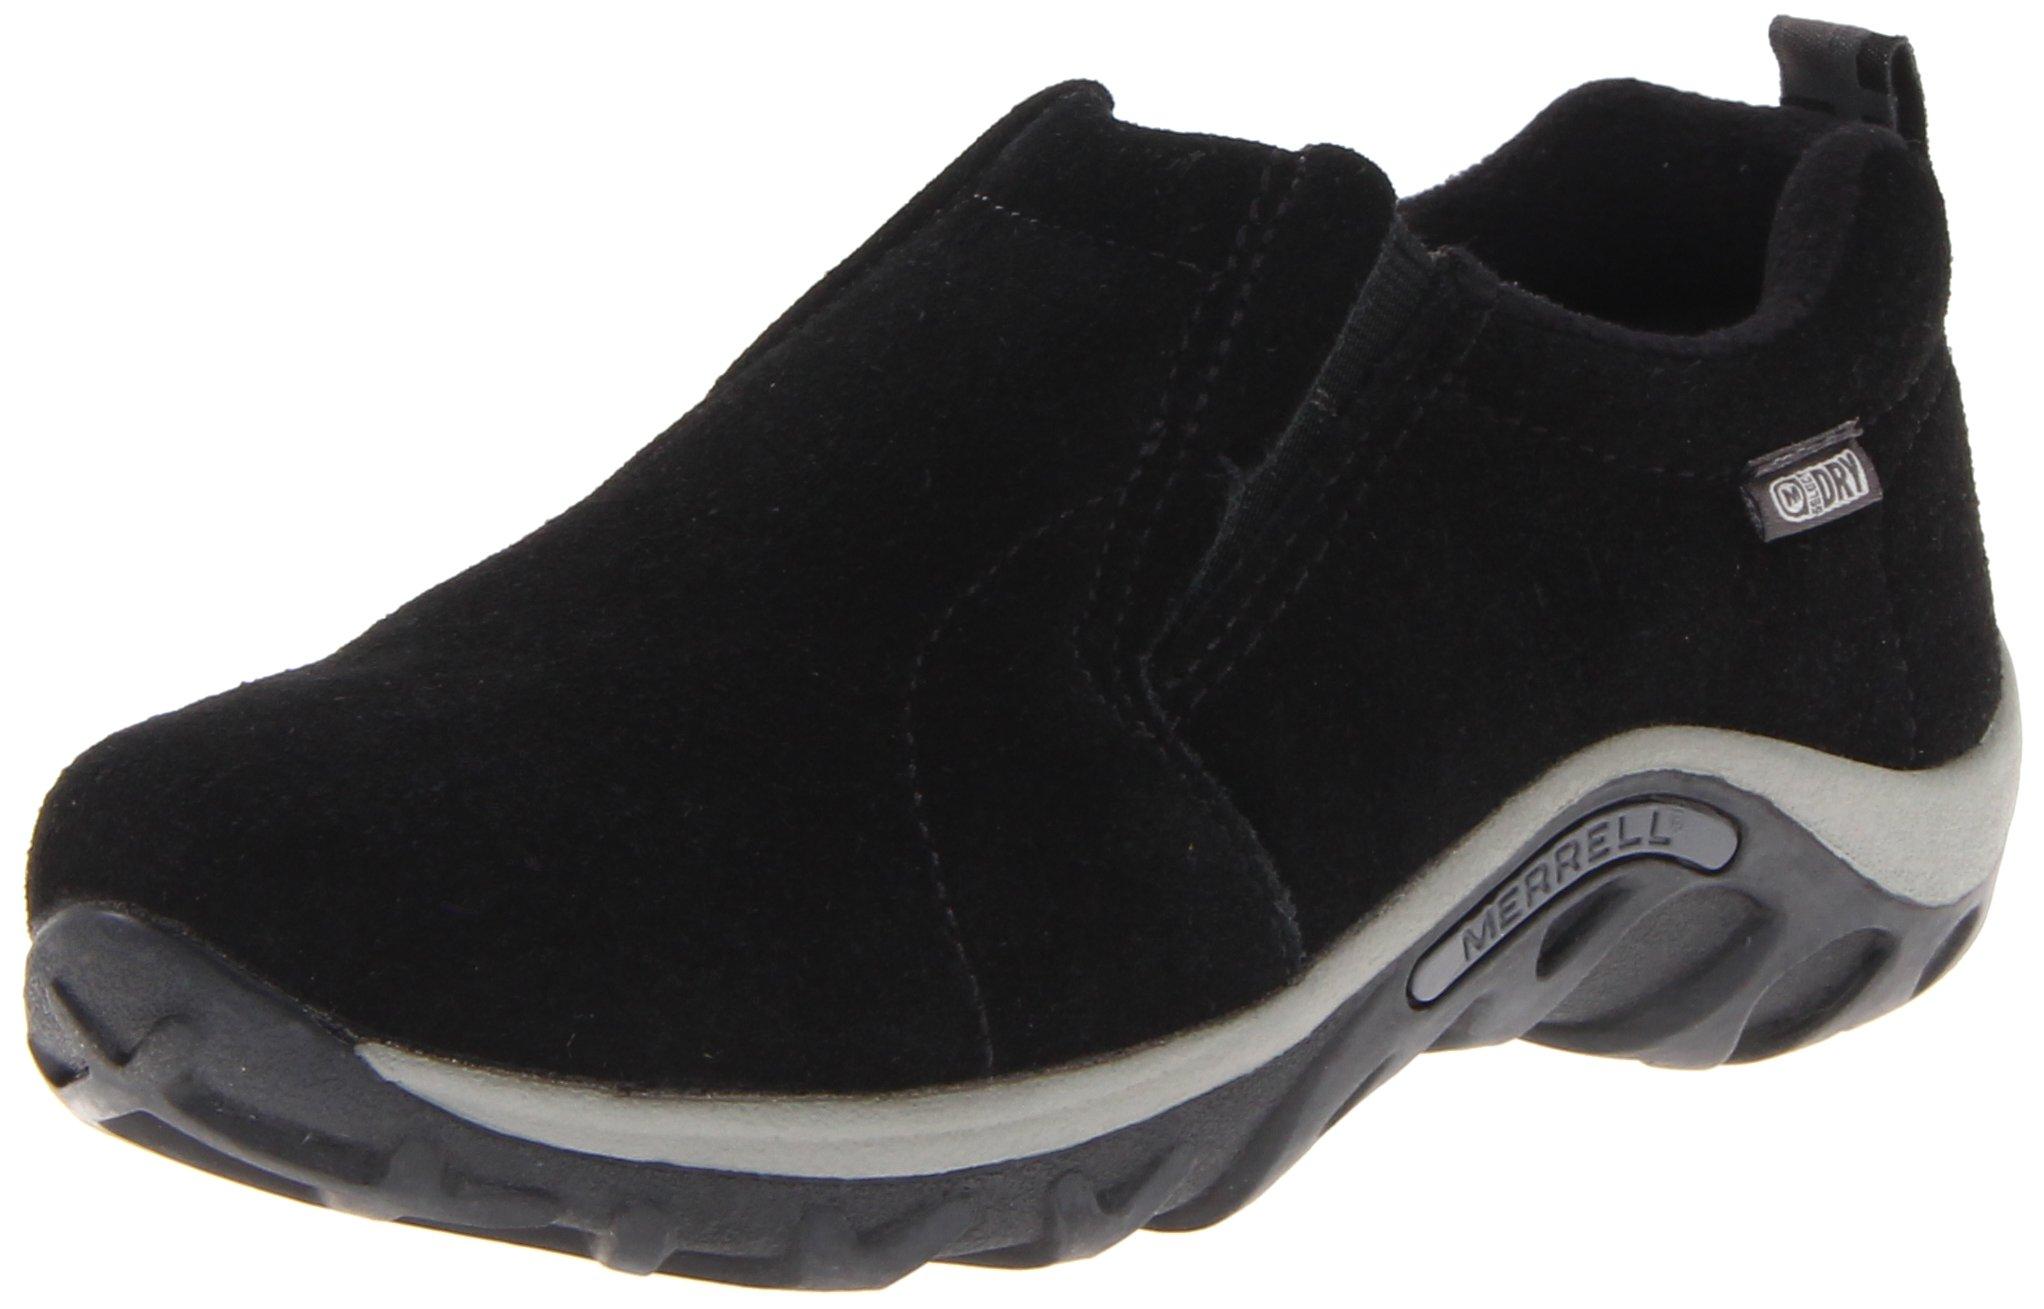 Merrell Jungle Moc Frosty Waterproof Slip-On Shoe (Toddler/Little Kid/Big Kid),Black,10 M US Toddler